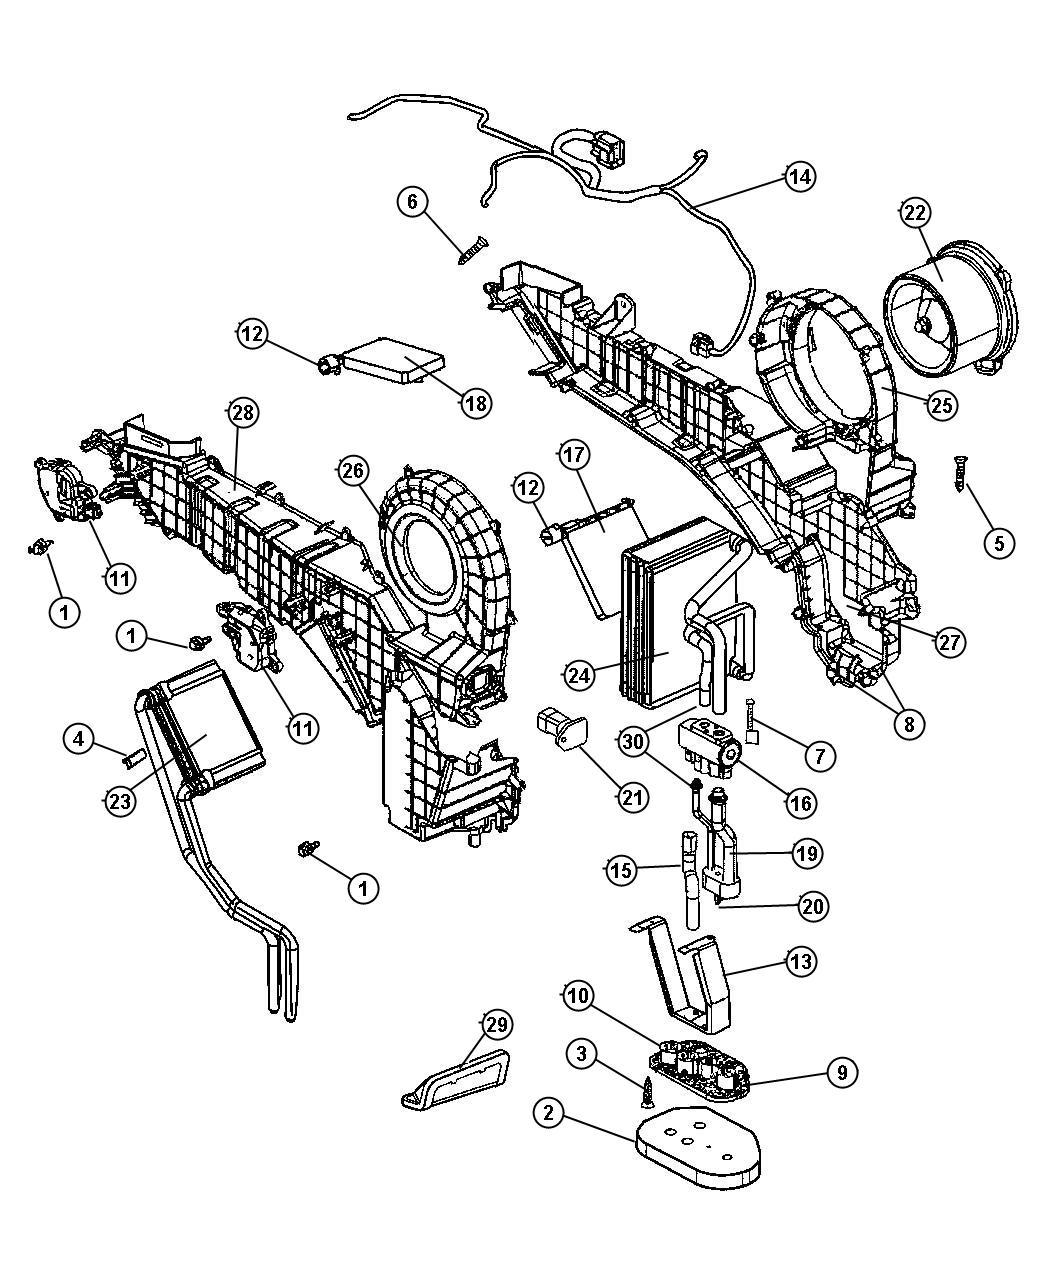 Dodge Ram Coupling Motor Link Actuator Air Conditioning Flange Servo Rubber